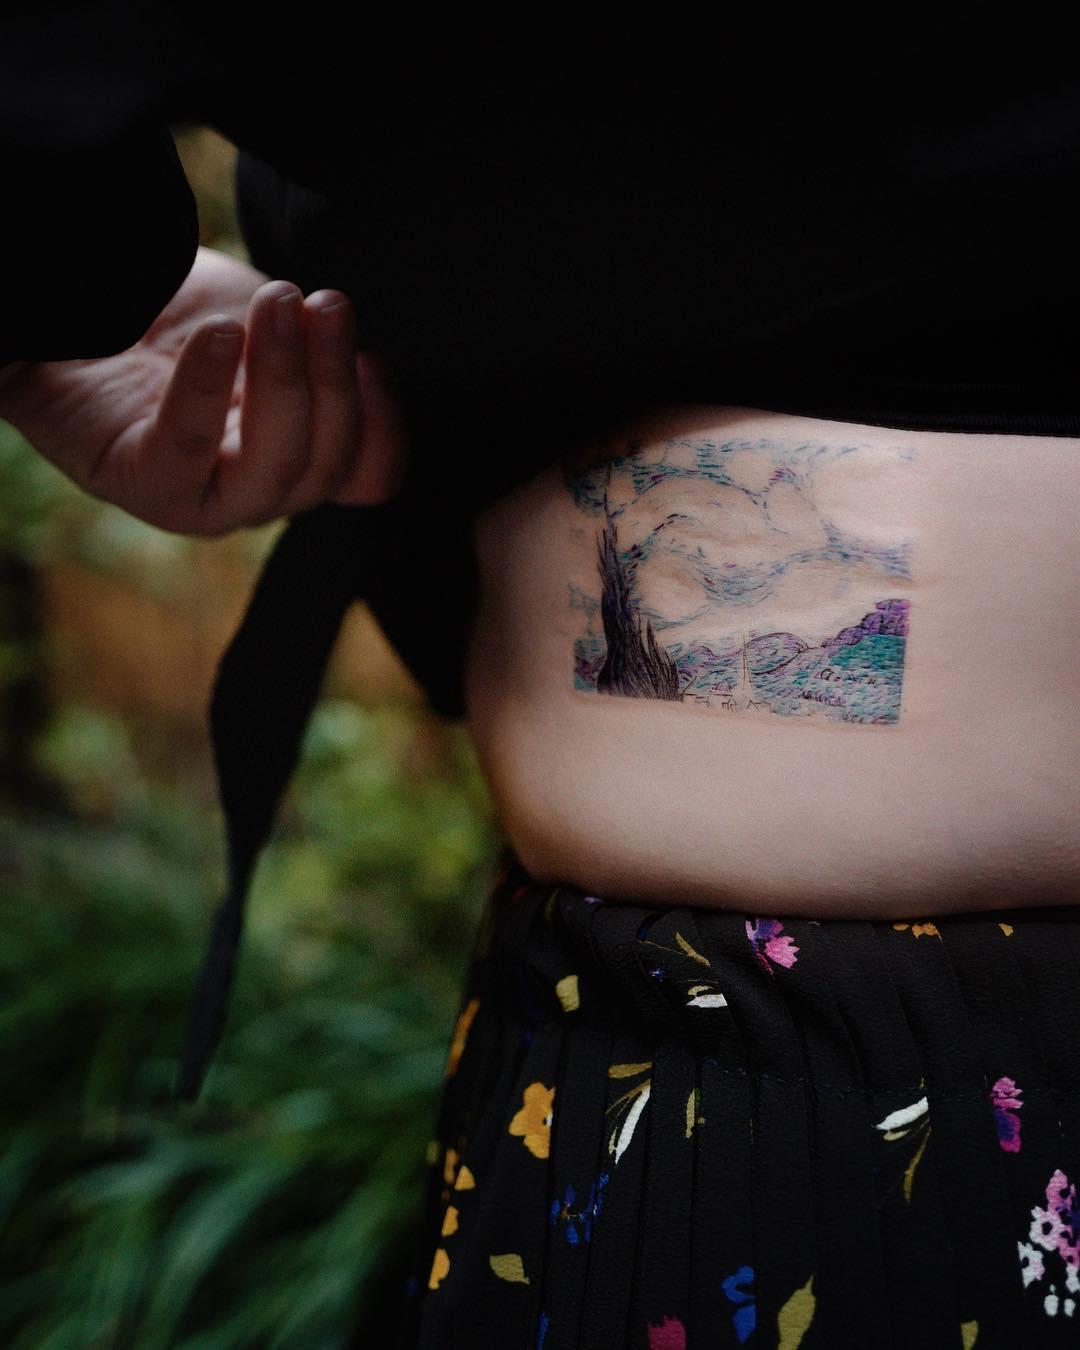 Starry Night tattoo by Studio Bysol